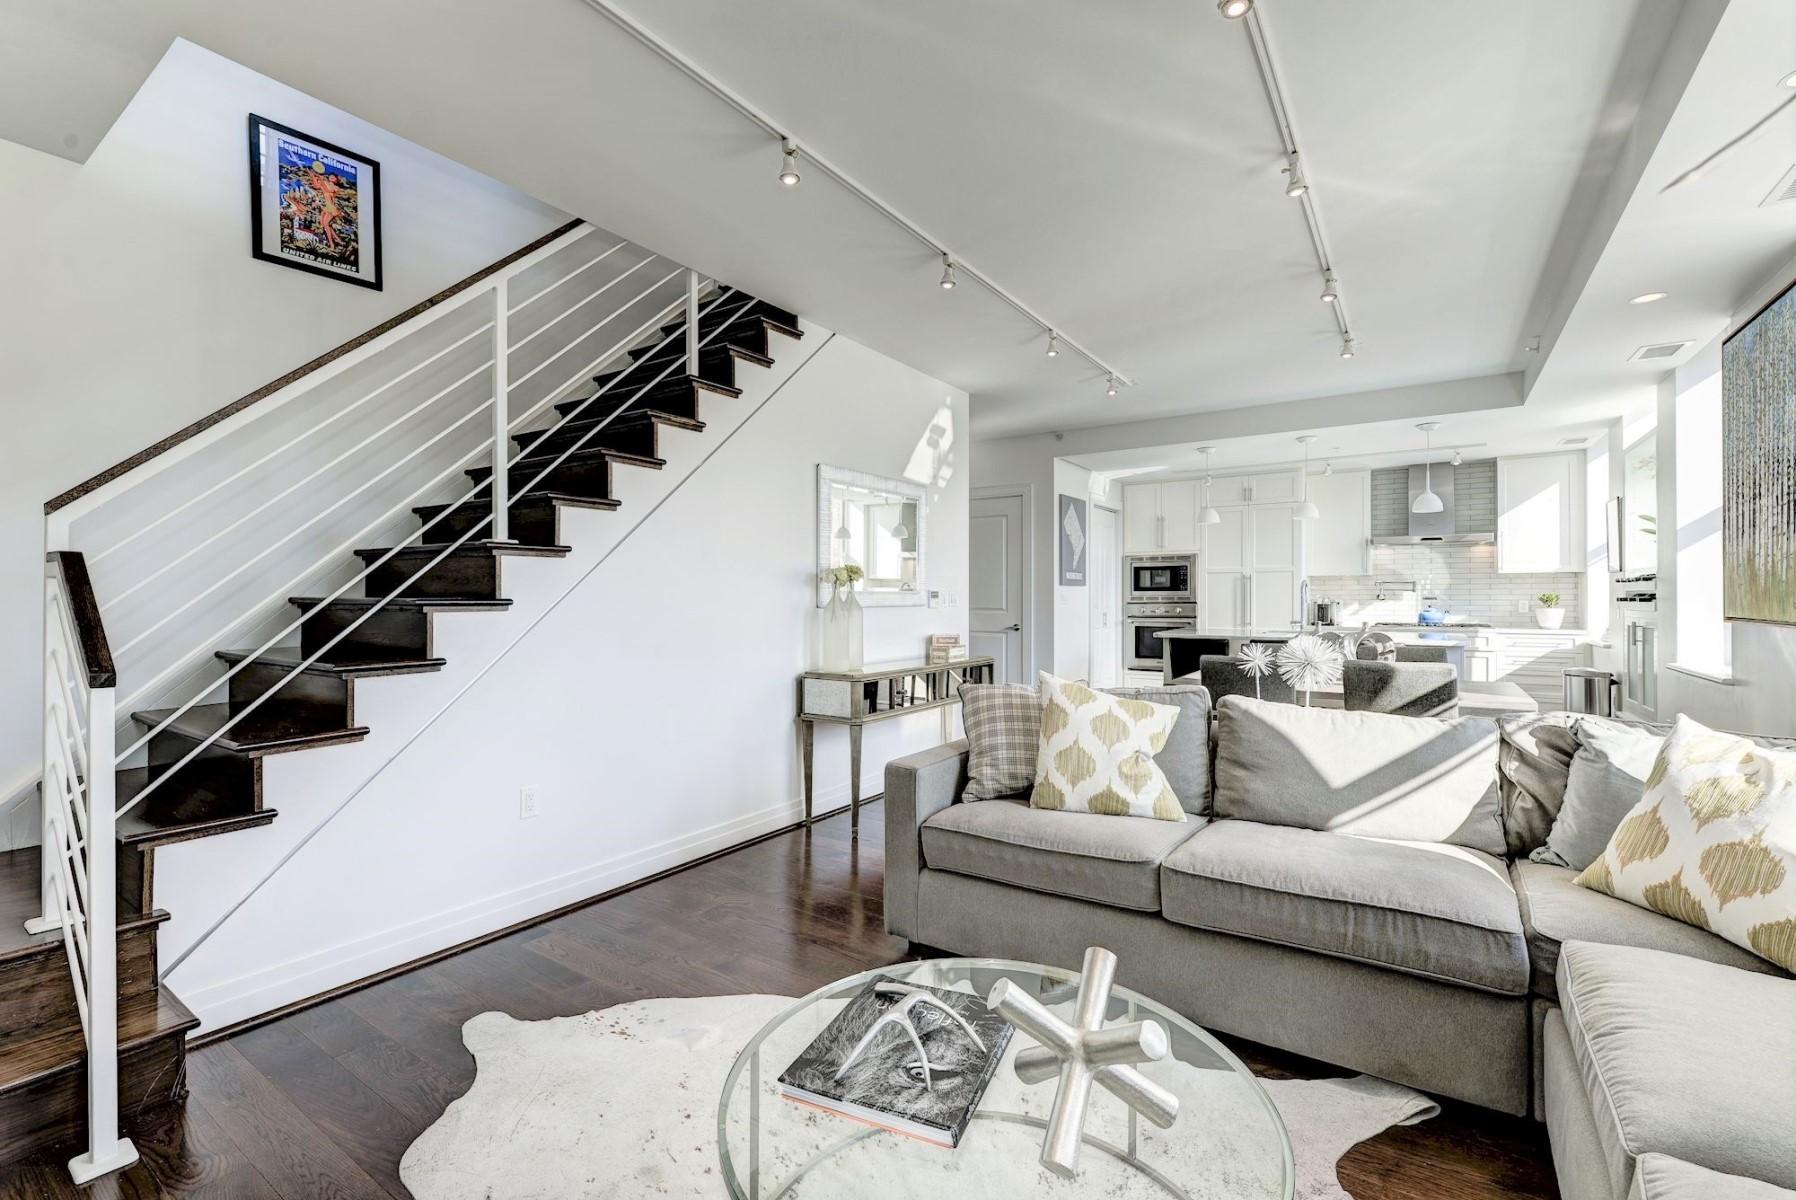 Additional photo for property listing at 3052 R Street Nw 303, Washington  Washington, Distrito De Columbia 20007 Estados Unidos